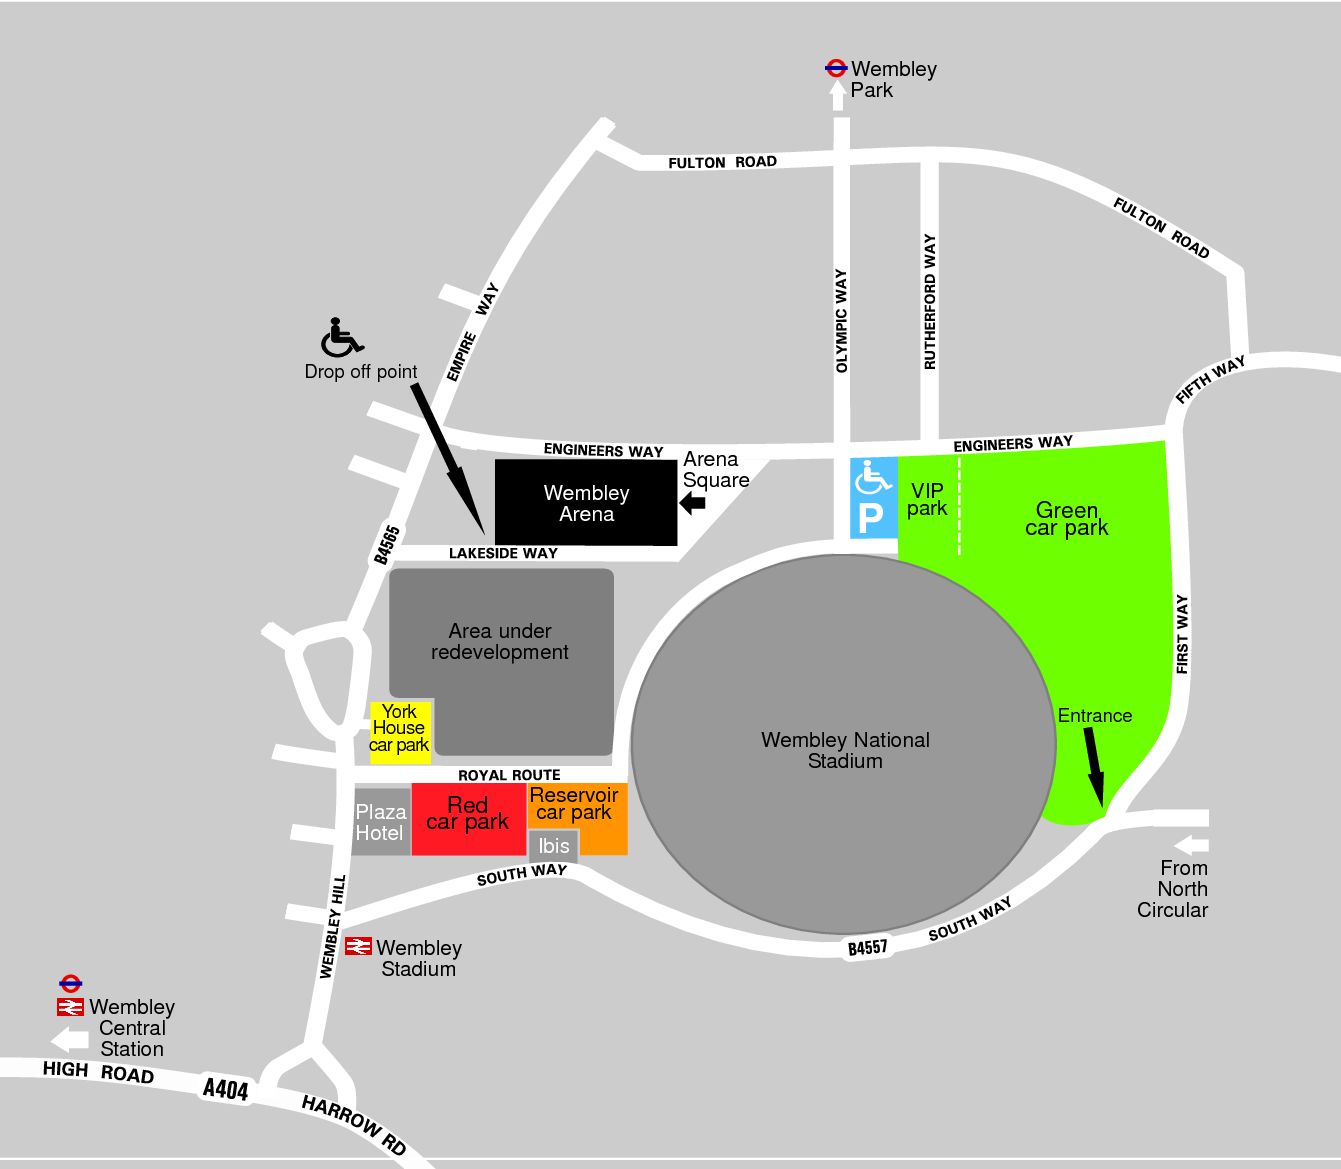 Wembley Stadium Green Car Park